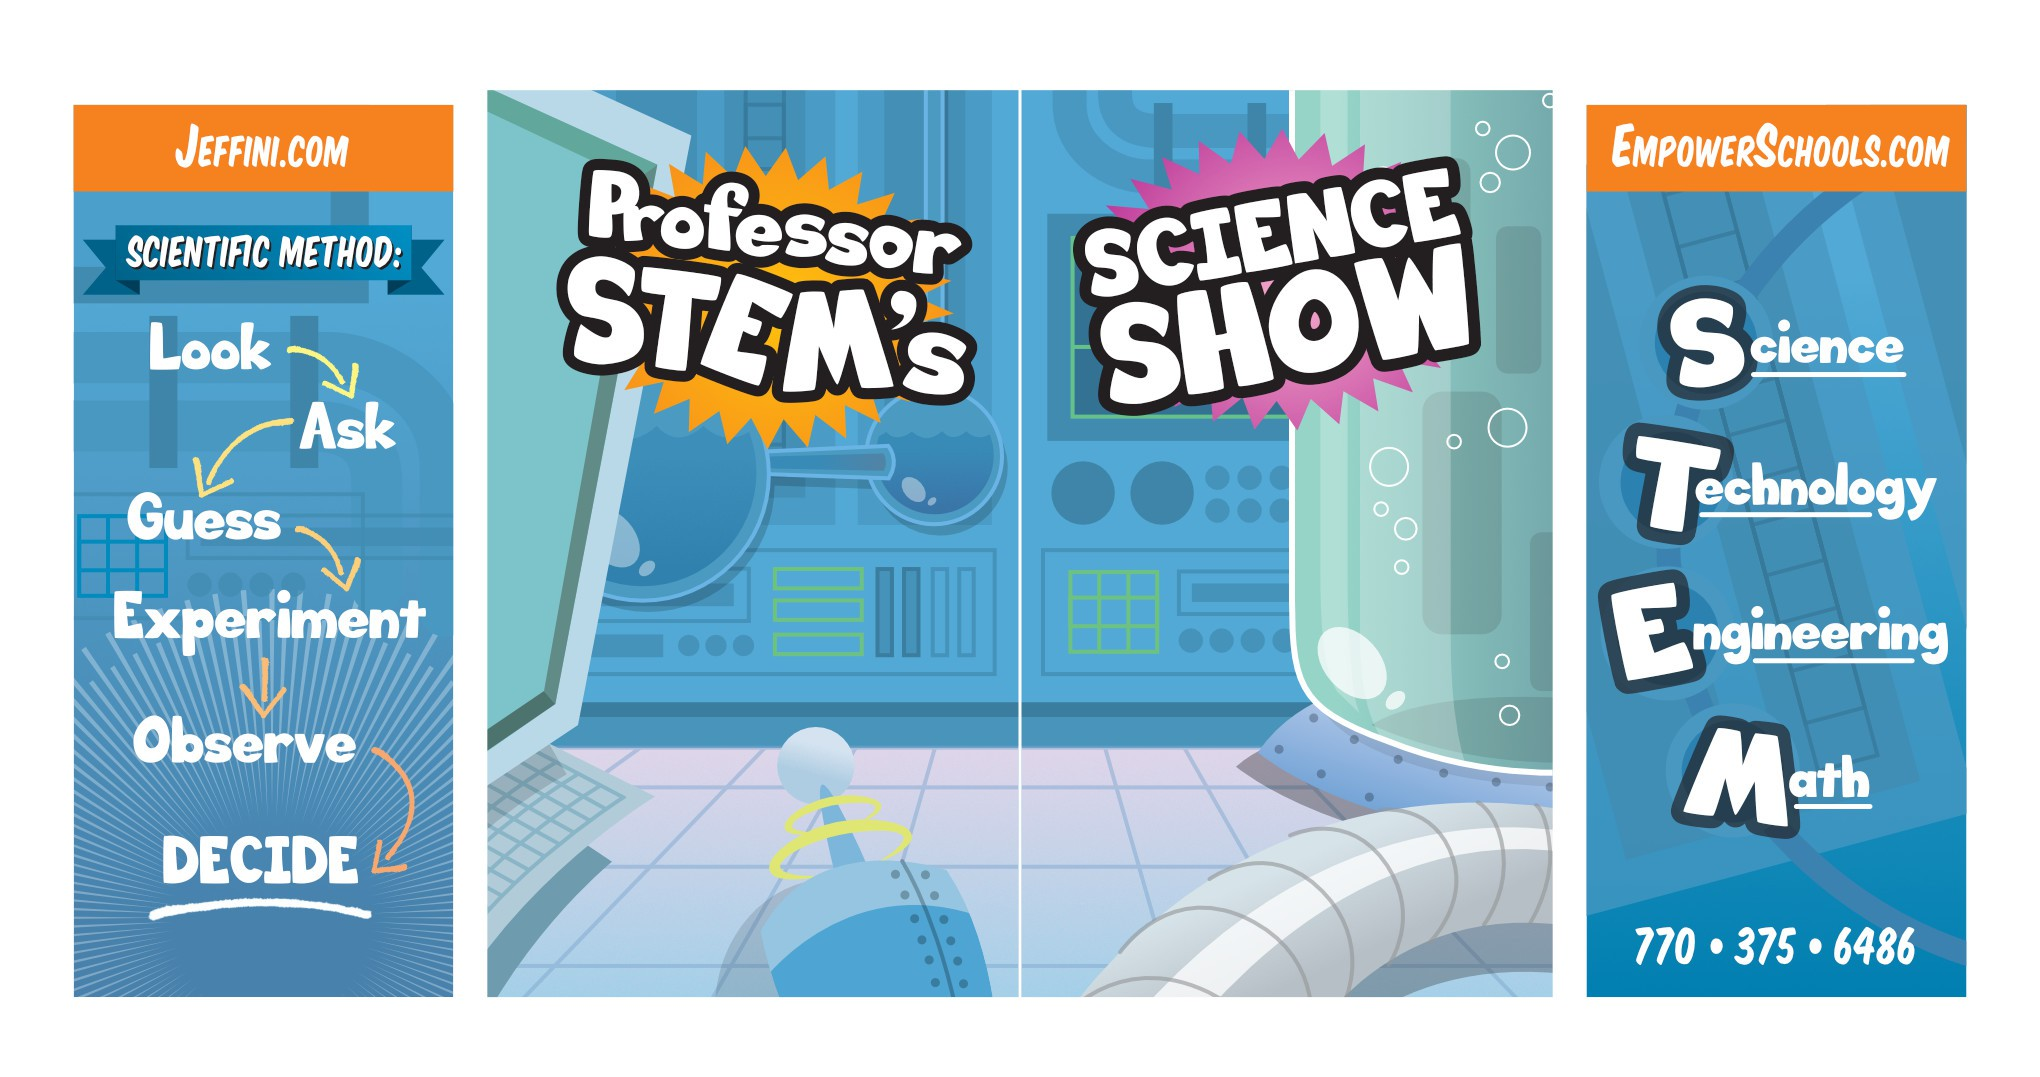 Professor STEM's Science Show